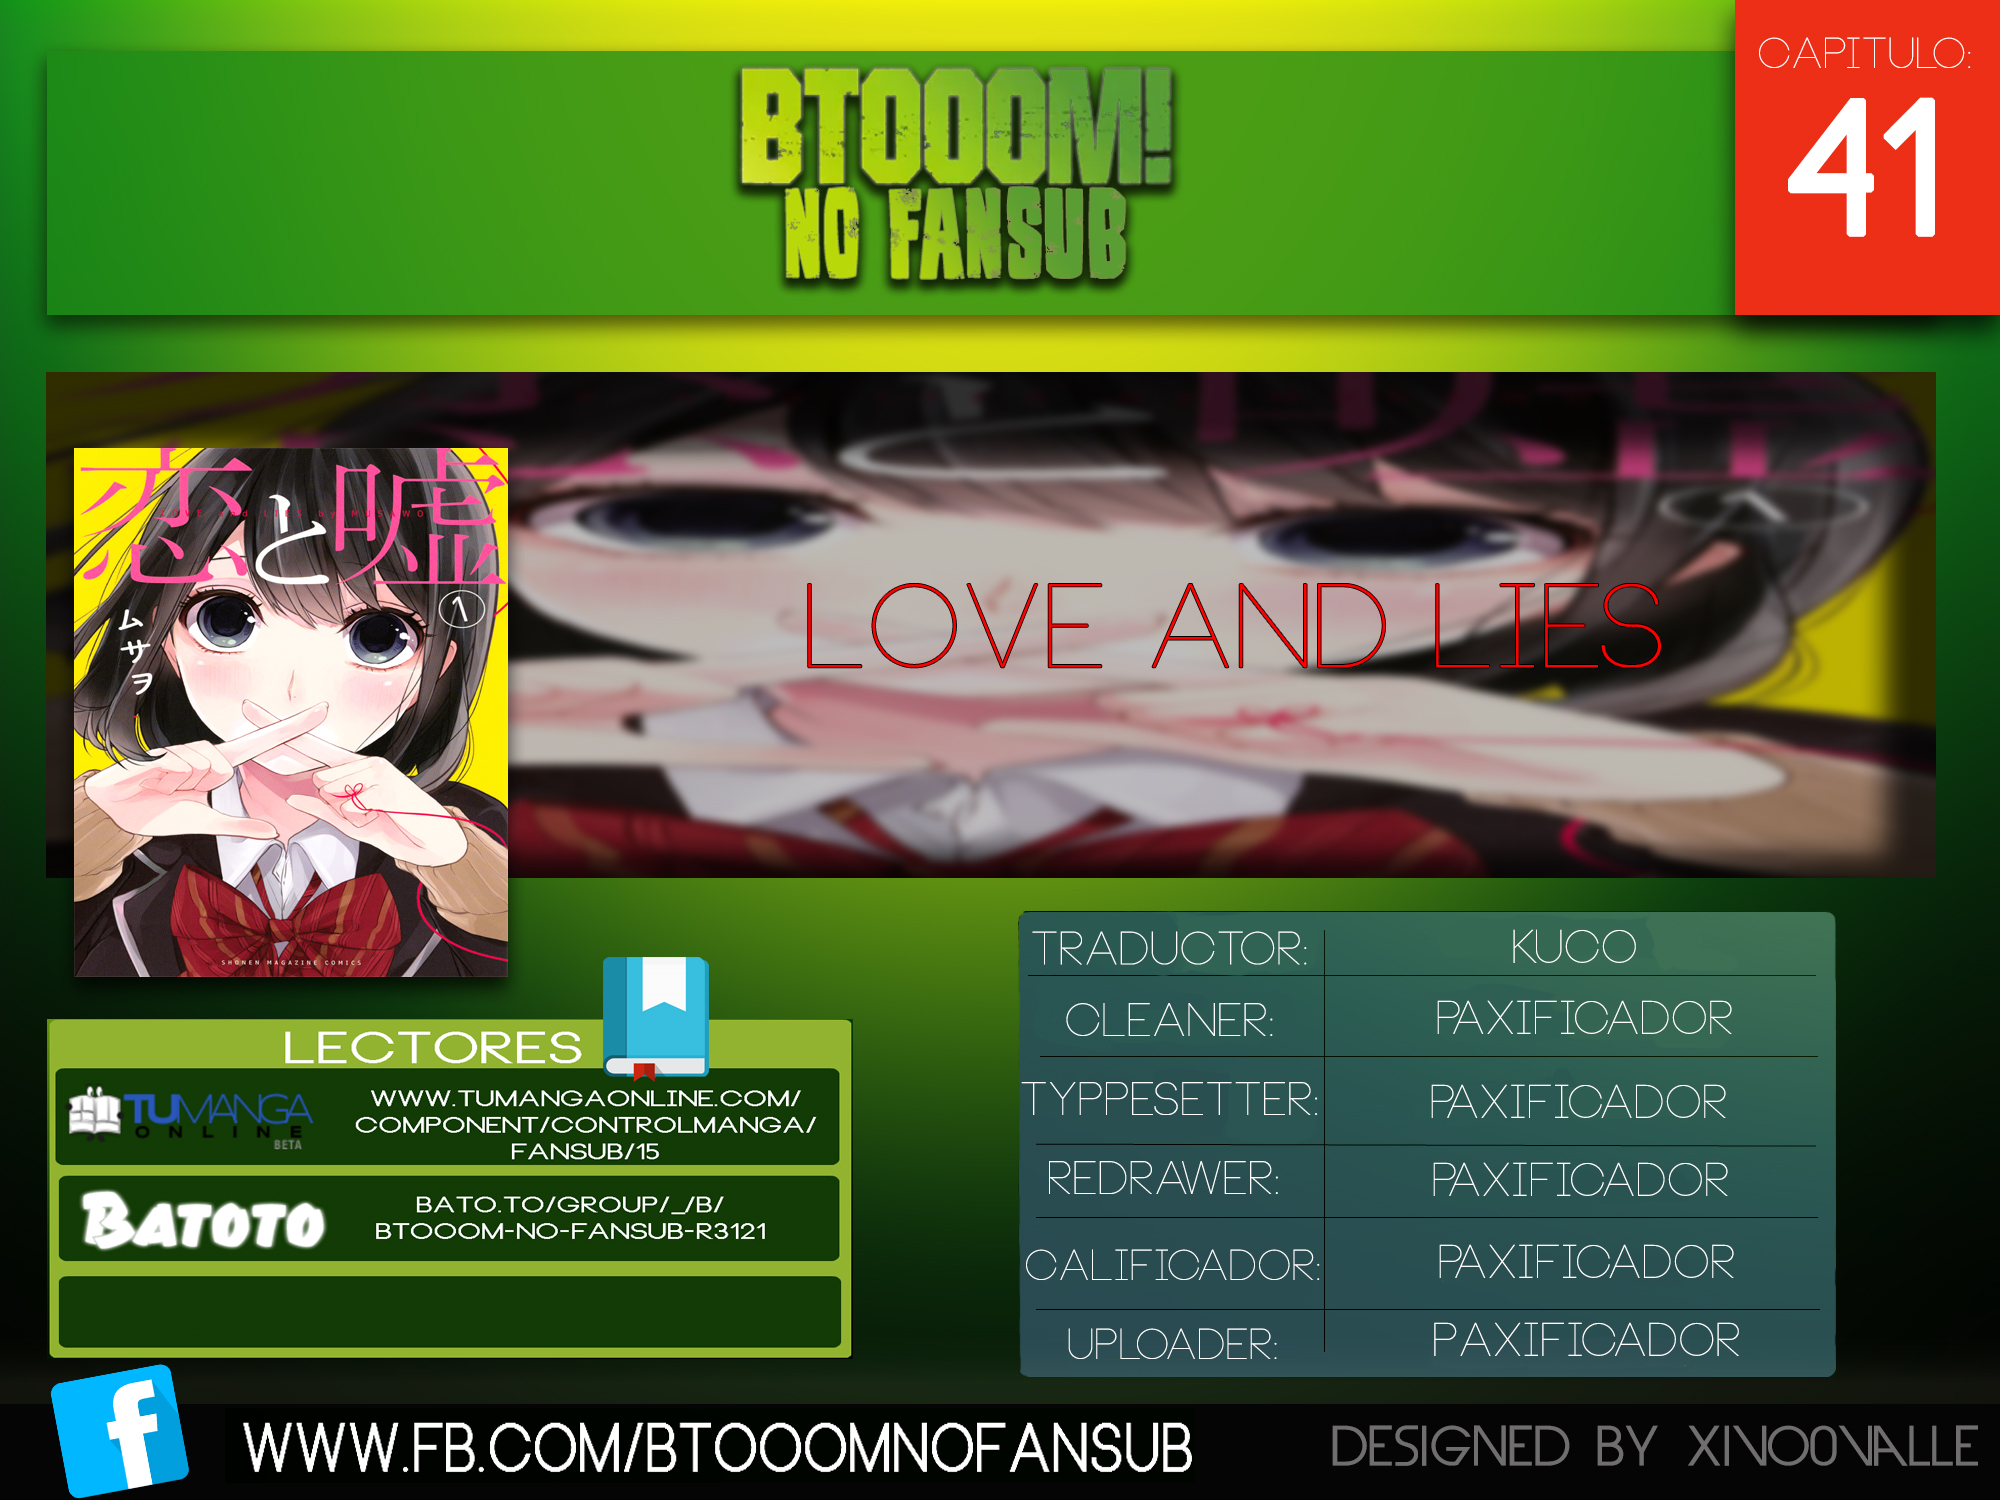 http://c5.ninemanga.com/es_manga/14/14734/383183/99fb7da17723eaf0421a7bbb9fada352.jpg Page 1